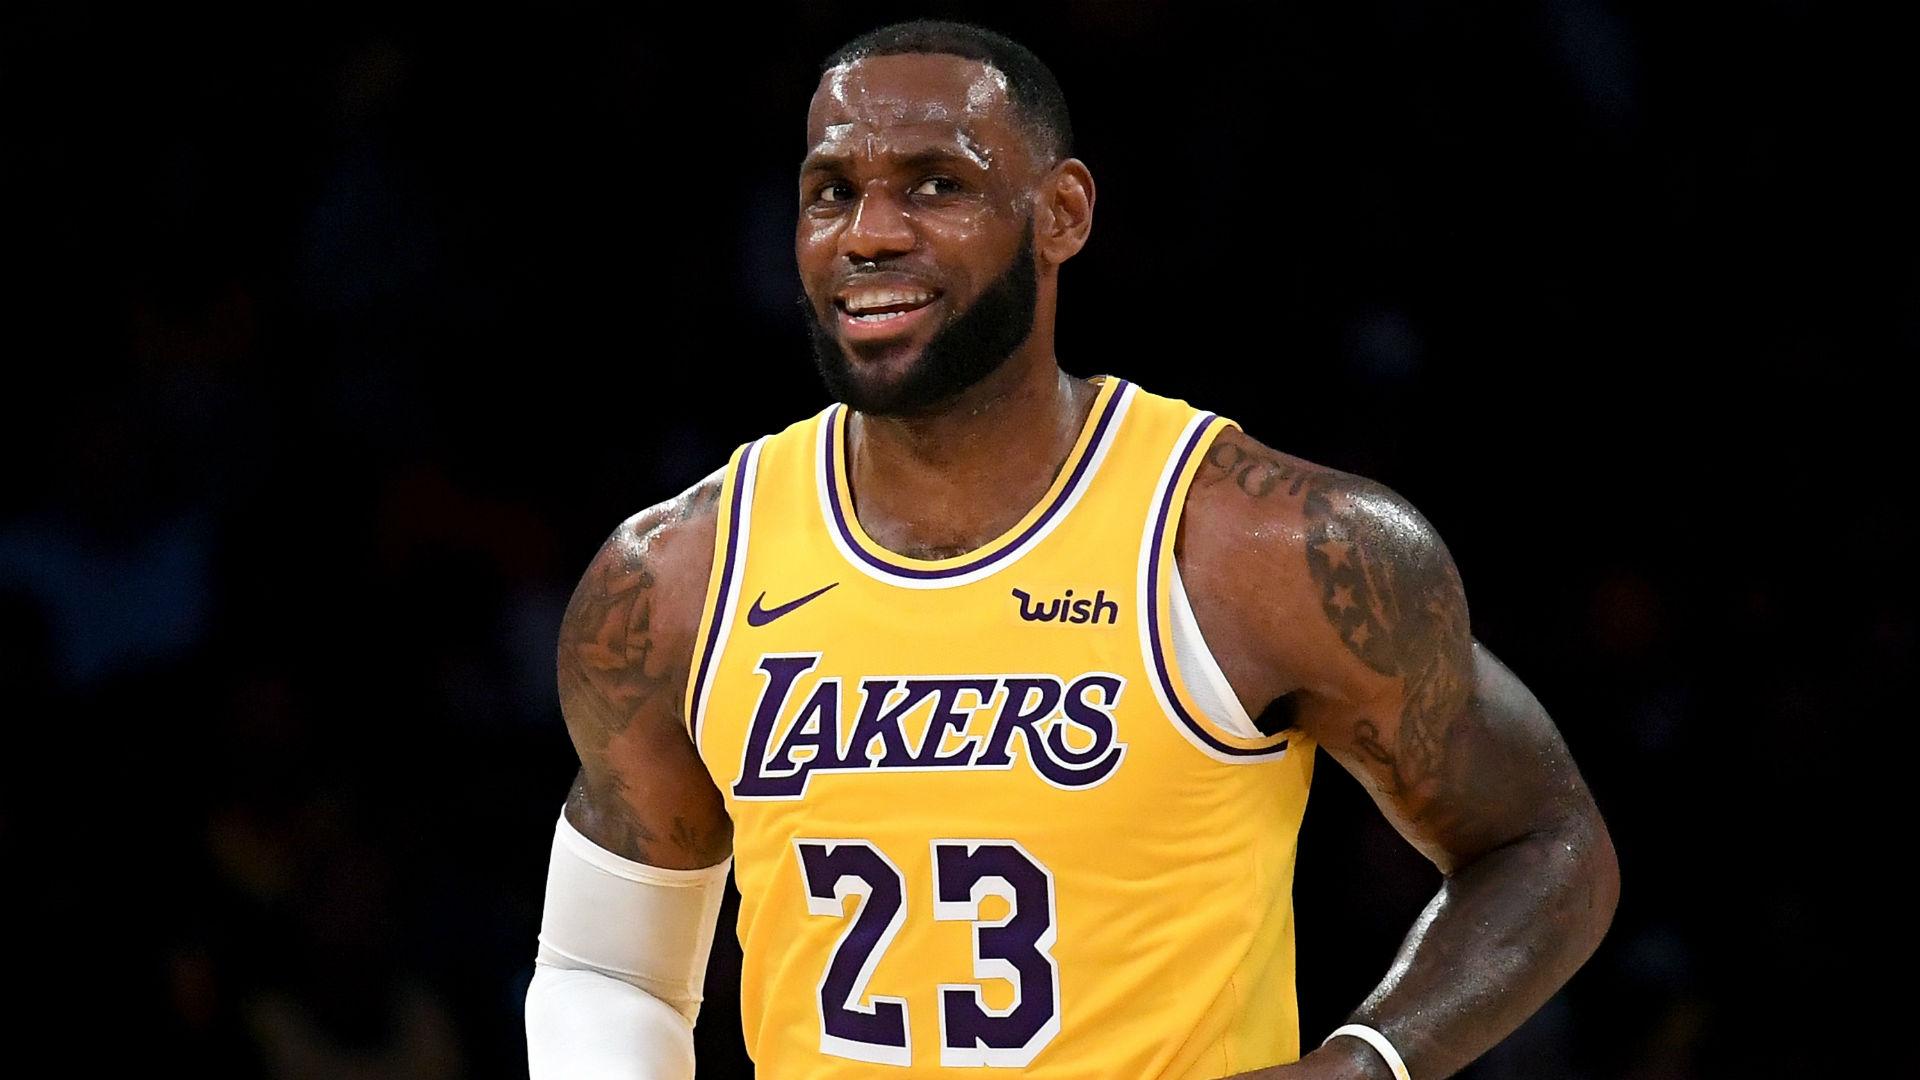 NBA: The LeBron James effect